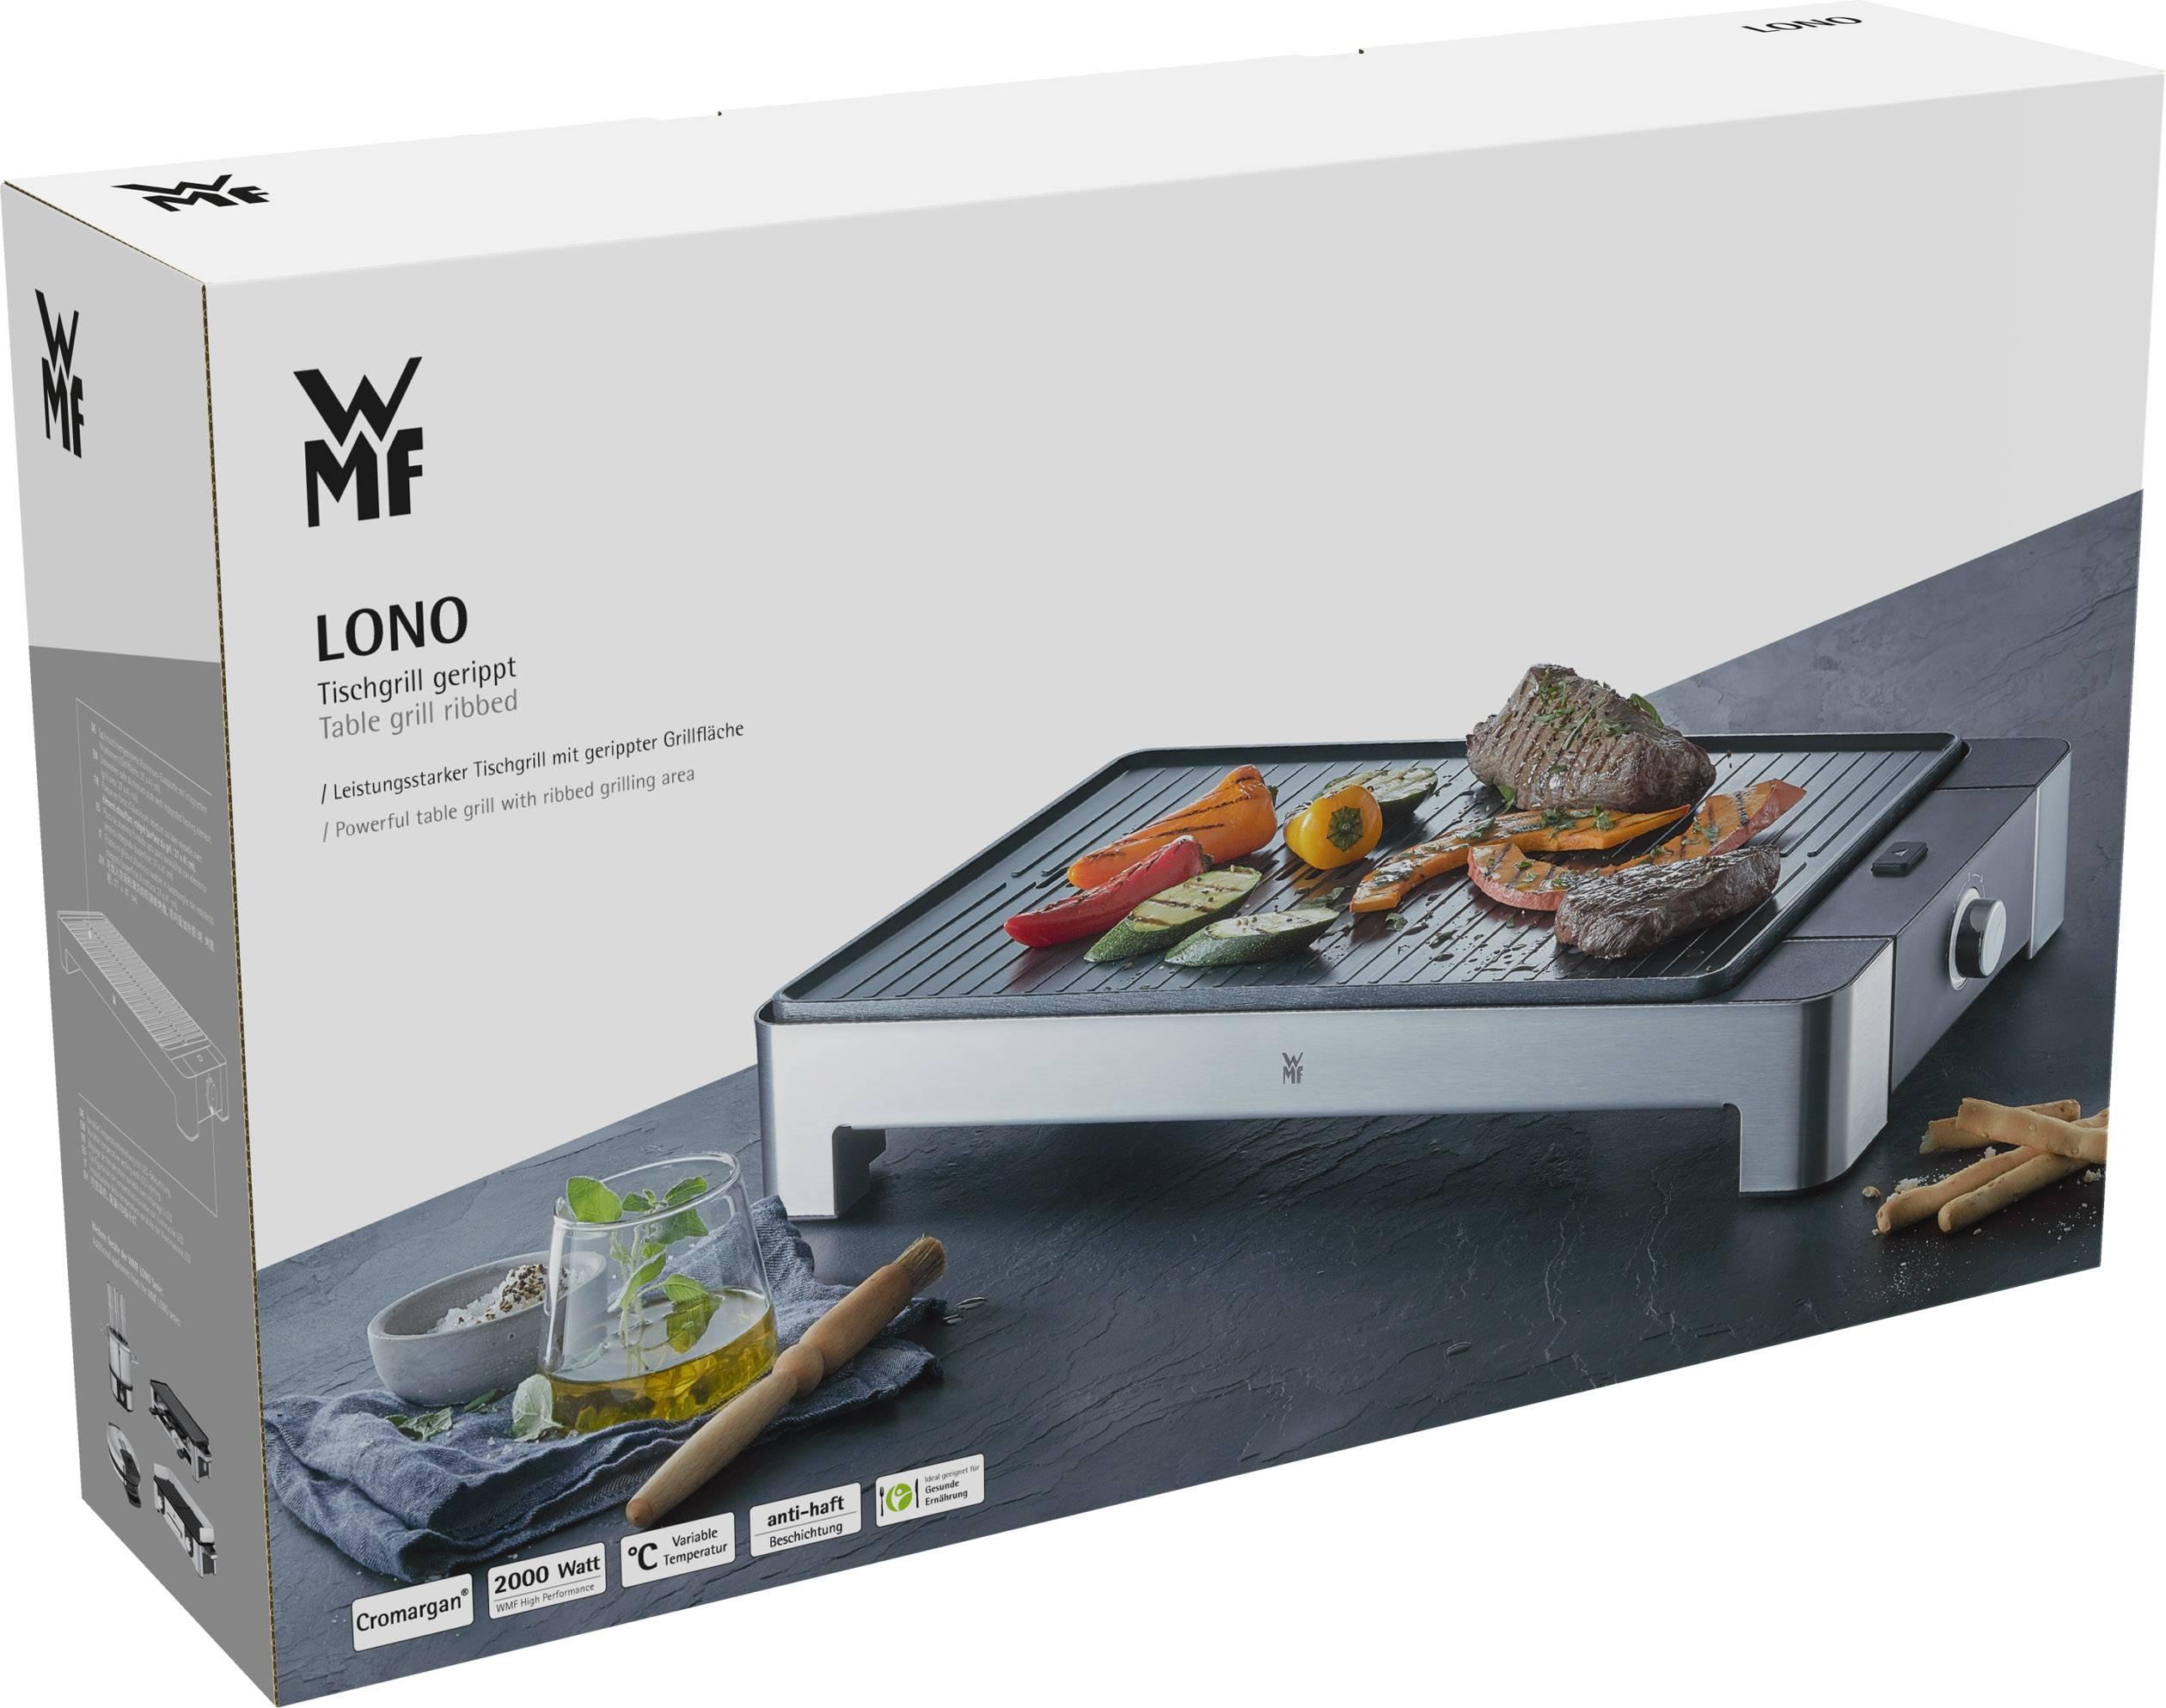 Wmf Cromargan Elektrogrill : Wmf lono master grill elektrogrill tischgrill edelstahl cromargan